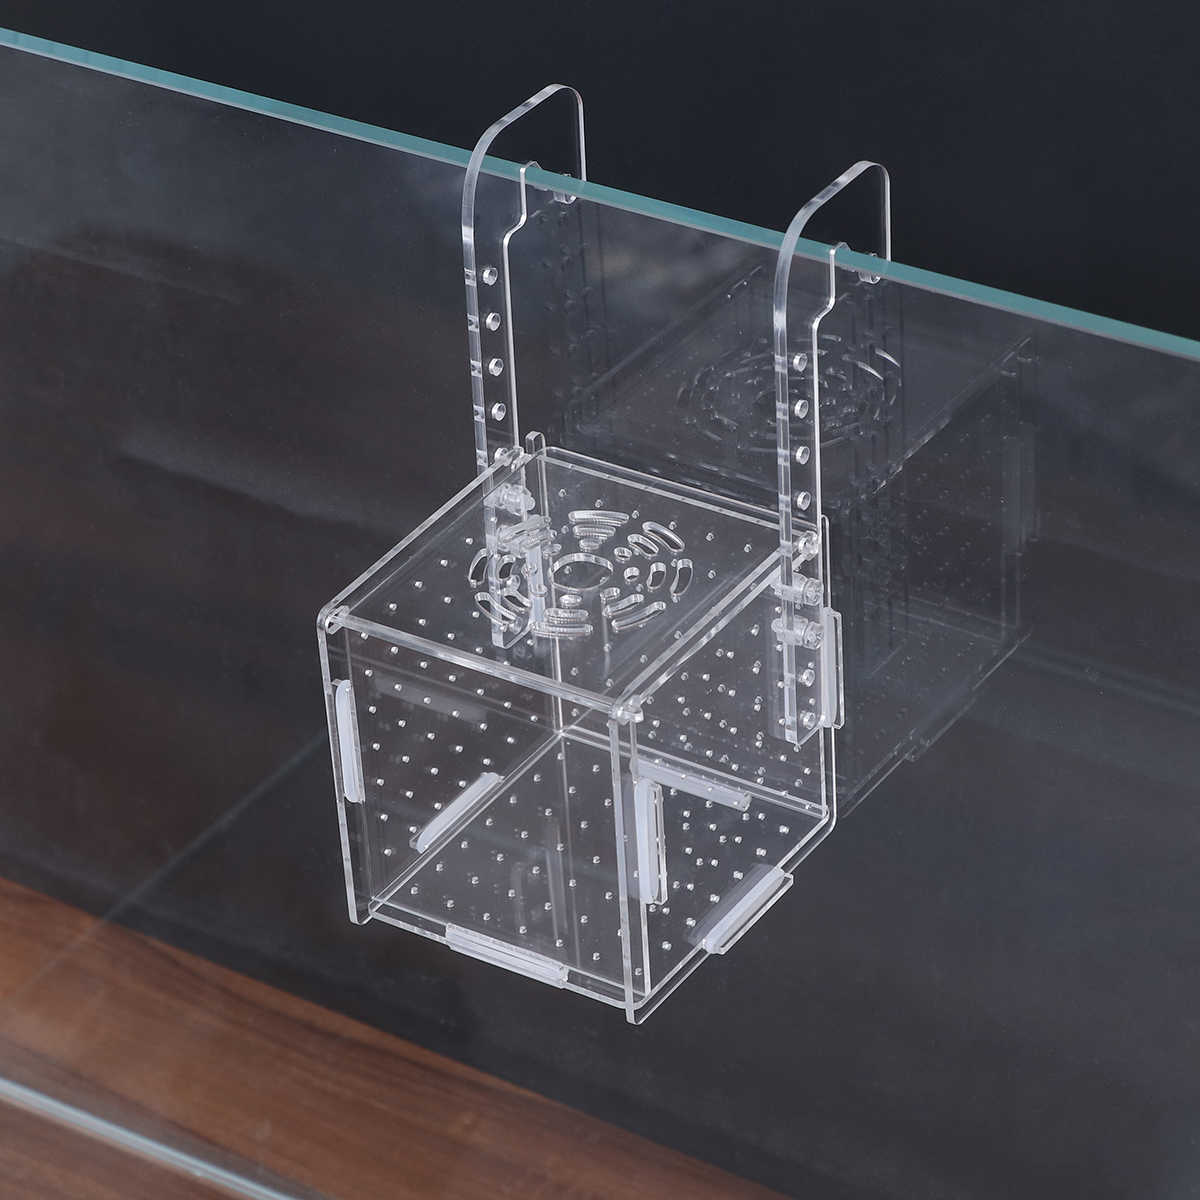 Acrylic Fish Tank Breeding Isolation Box Aquarium Hatchery Incubator Holder Tool